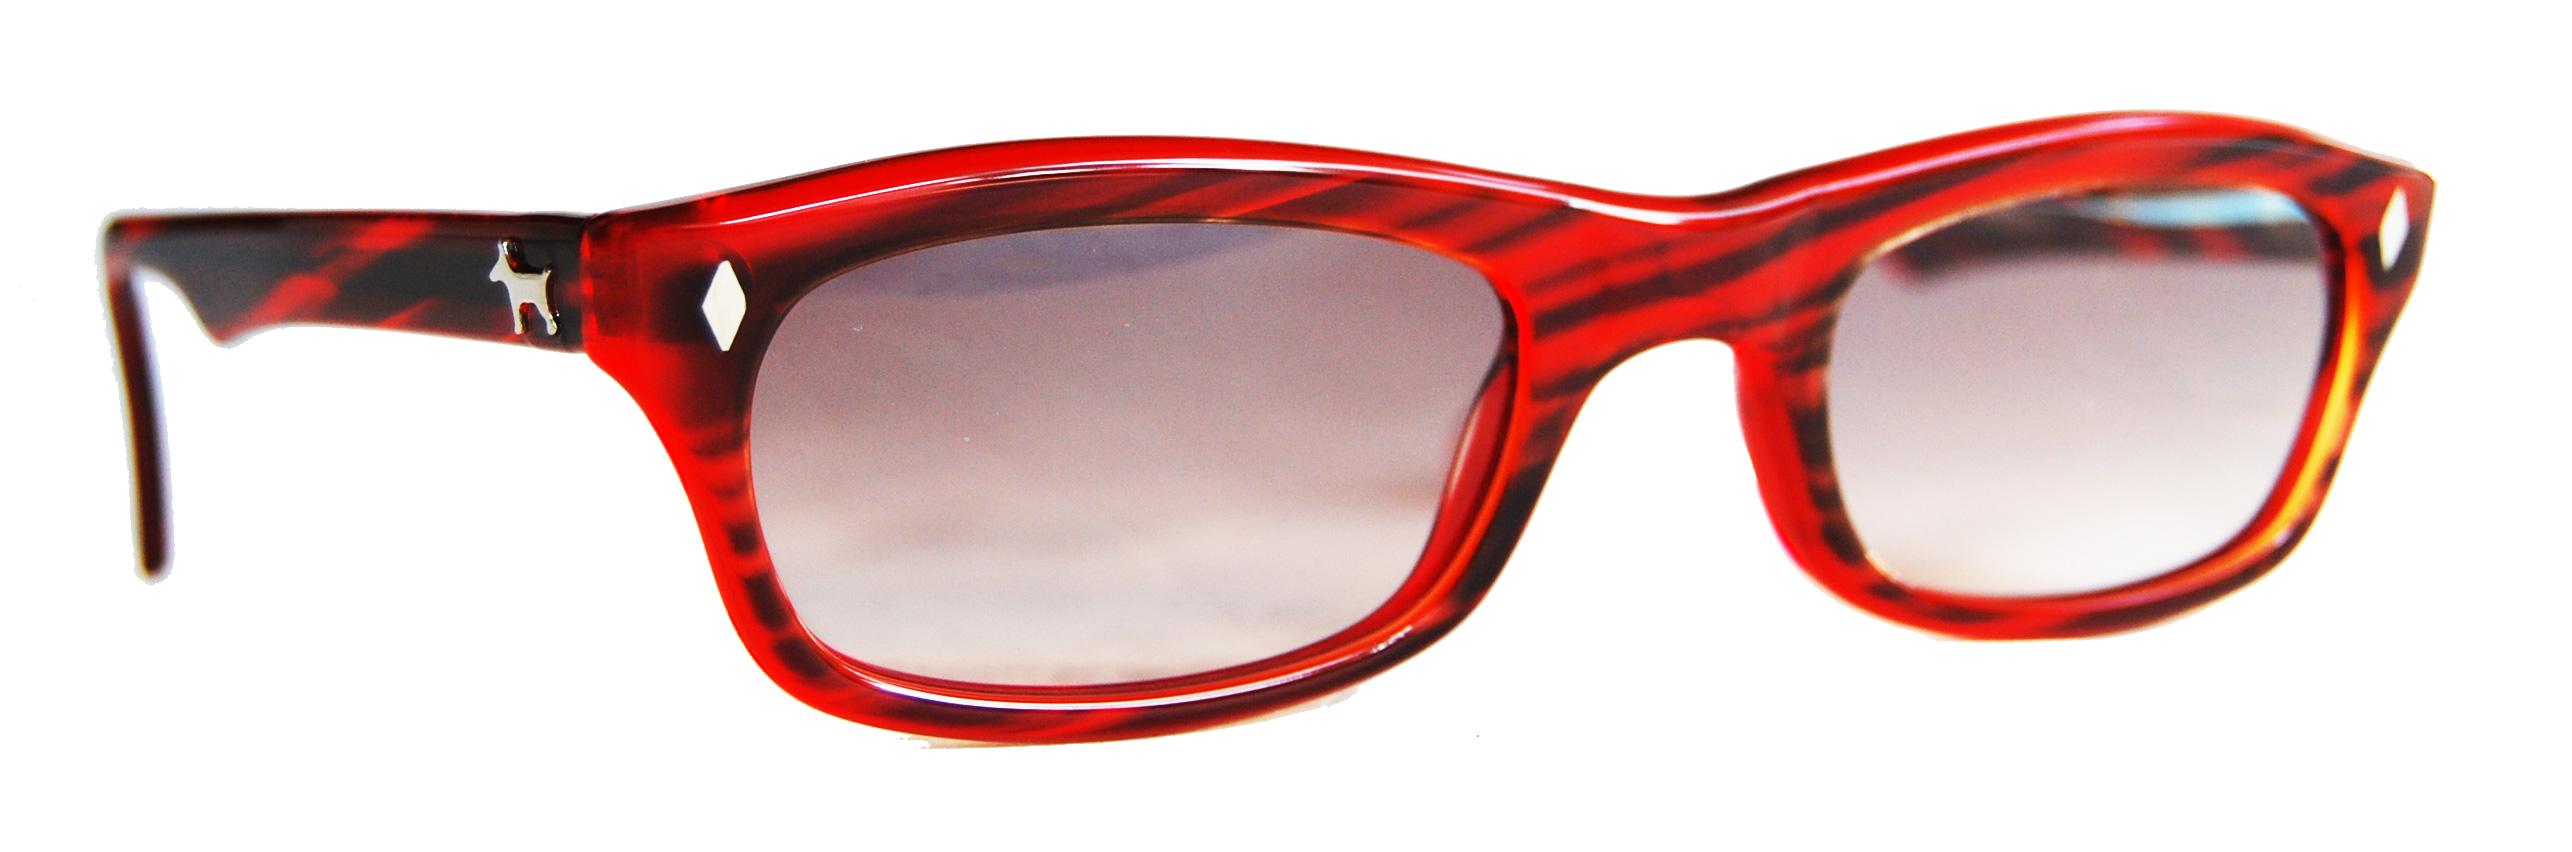 gillo eyewear